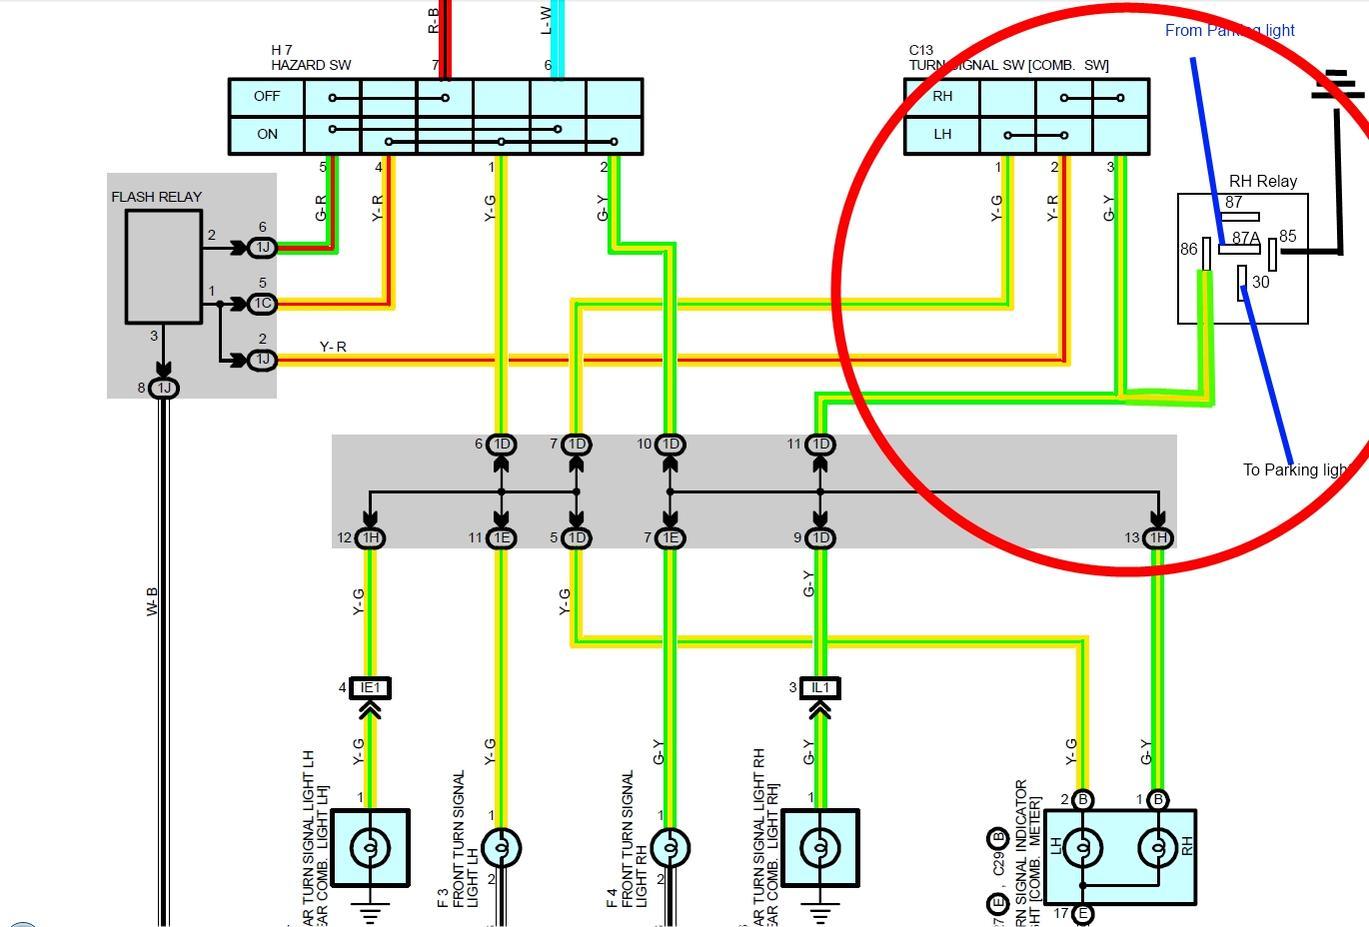 toyota land cruiser 1996 electrical wiring diagram solar pv uk lights parking light blinkers 4runner forum largest